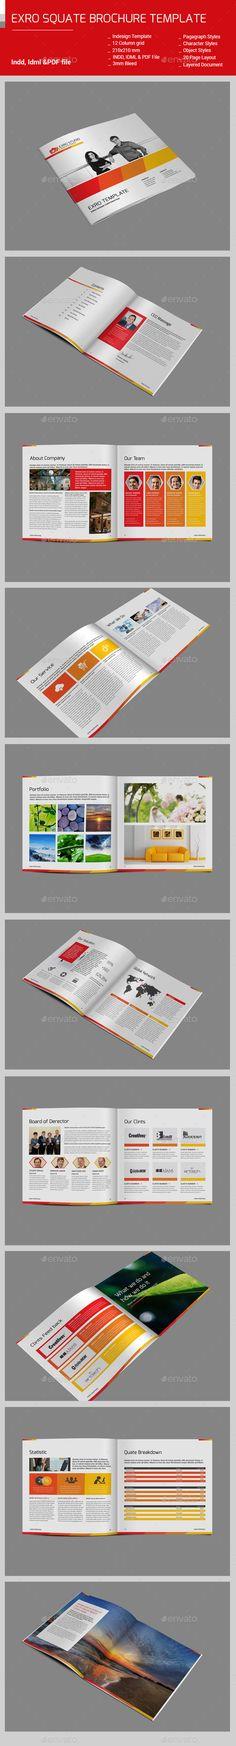 Exro Square Brochure Template #design Download: http://graphicriver.net/item/exro-square-brochuretemplate/13075375?ref=ksioks